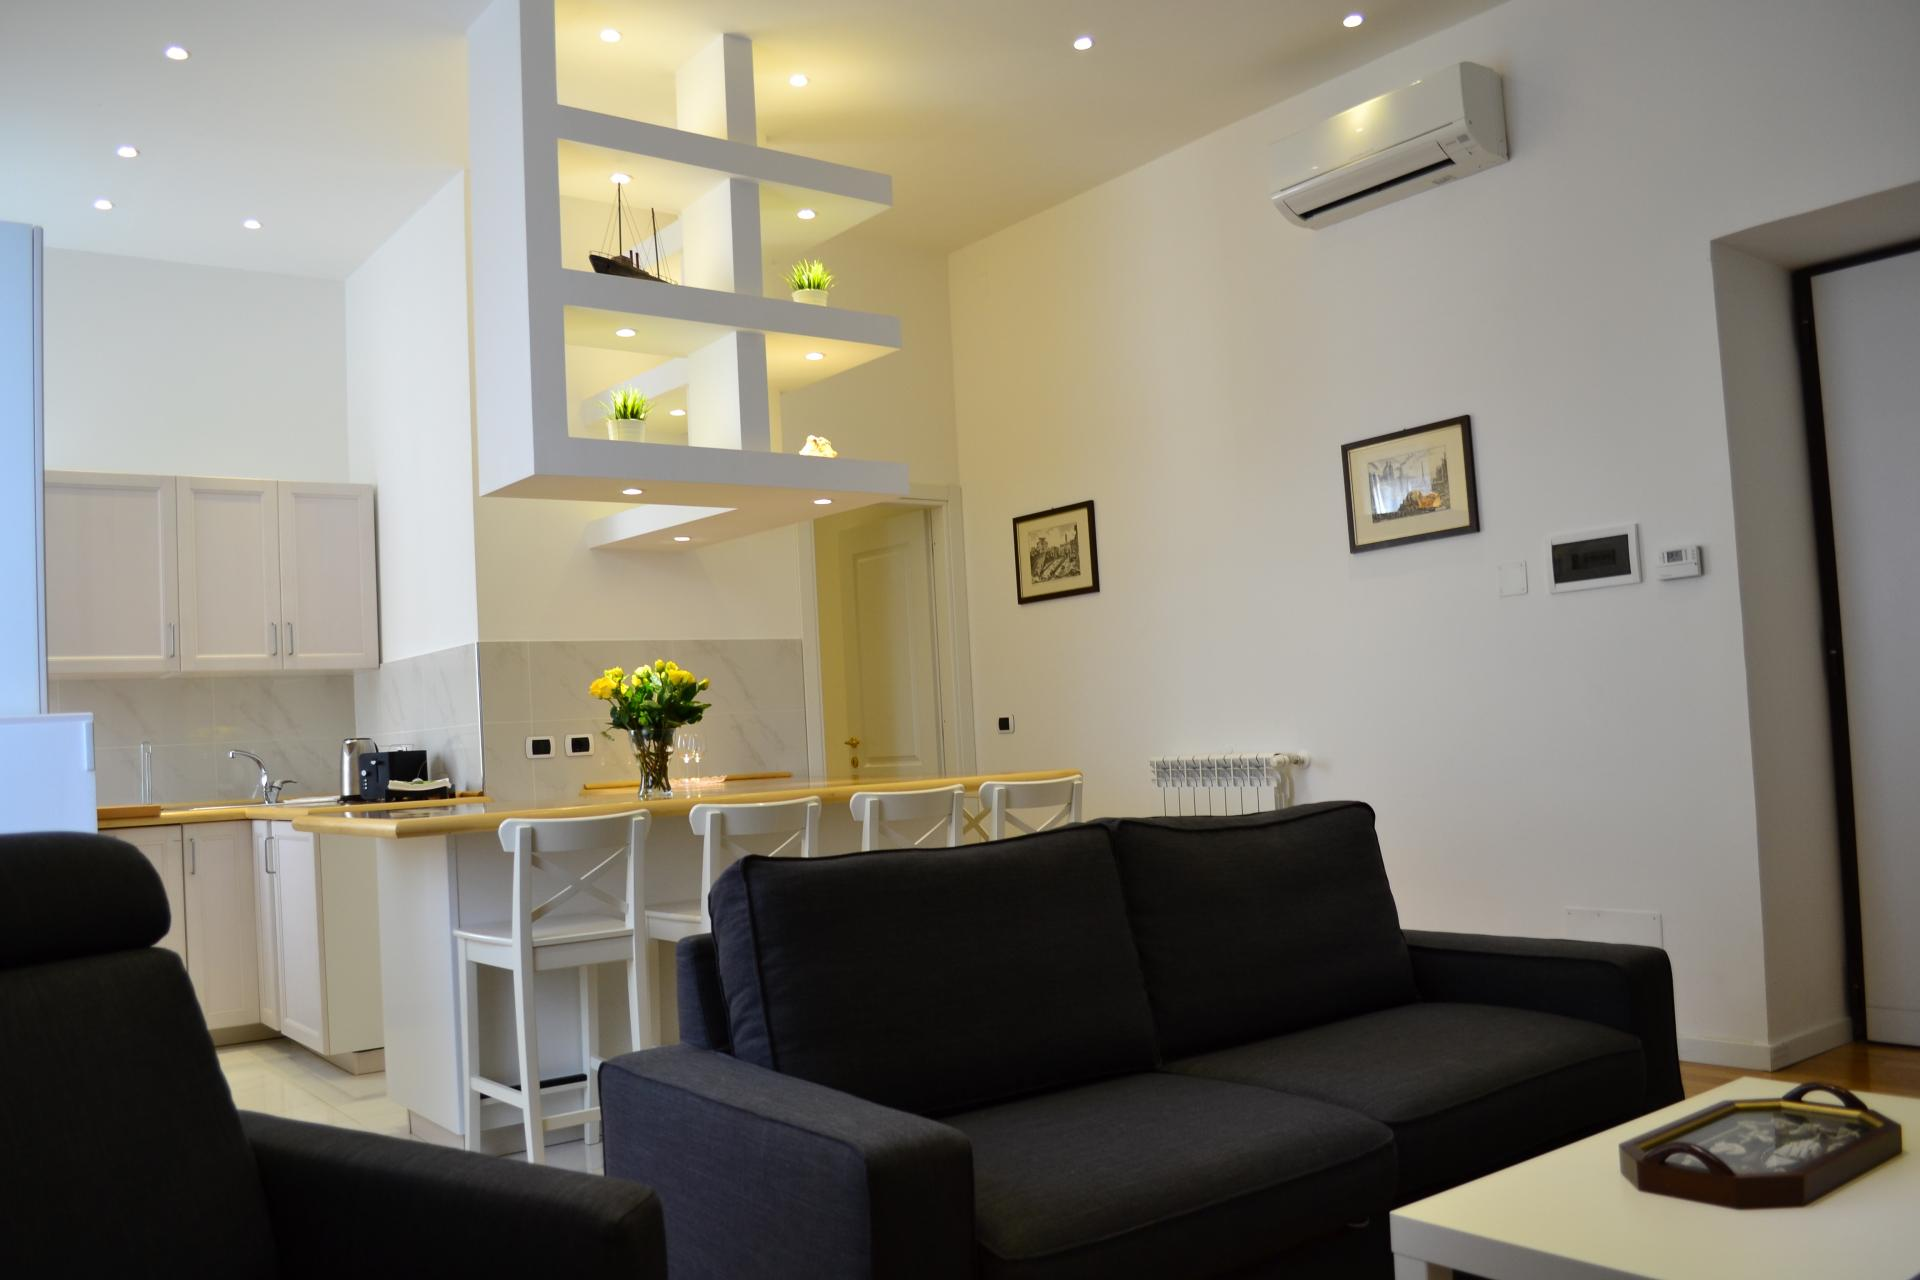 Seating at Angelico Grand Apartment, Prati, Rome